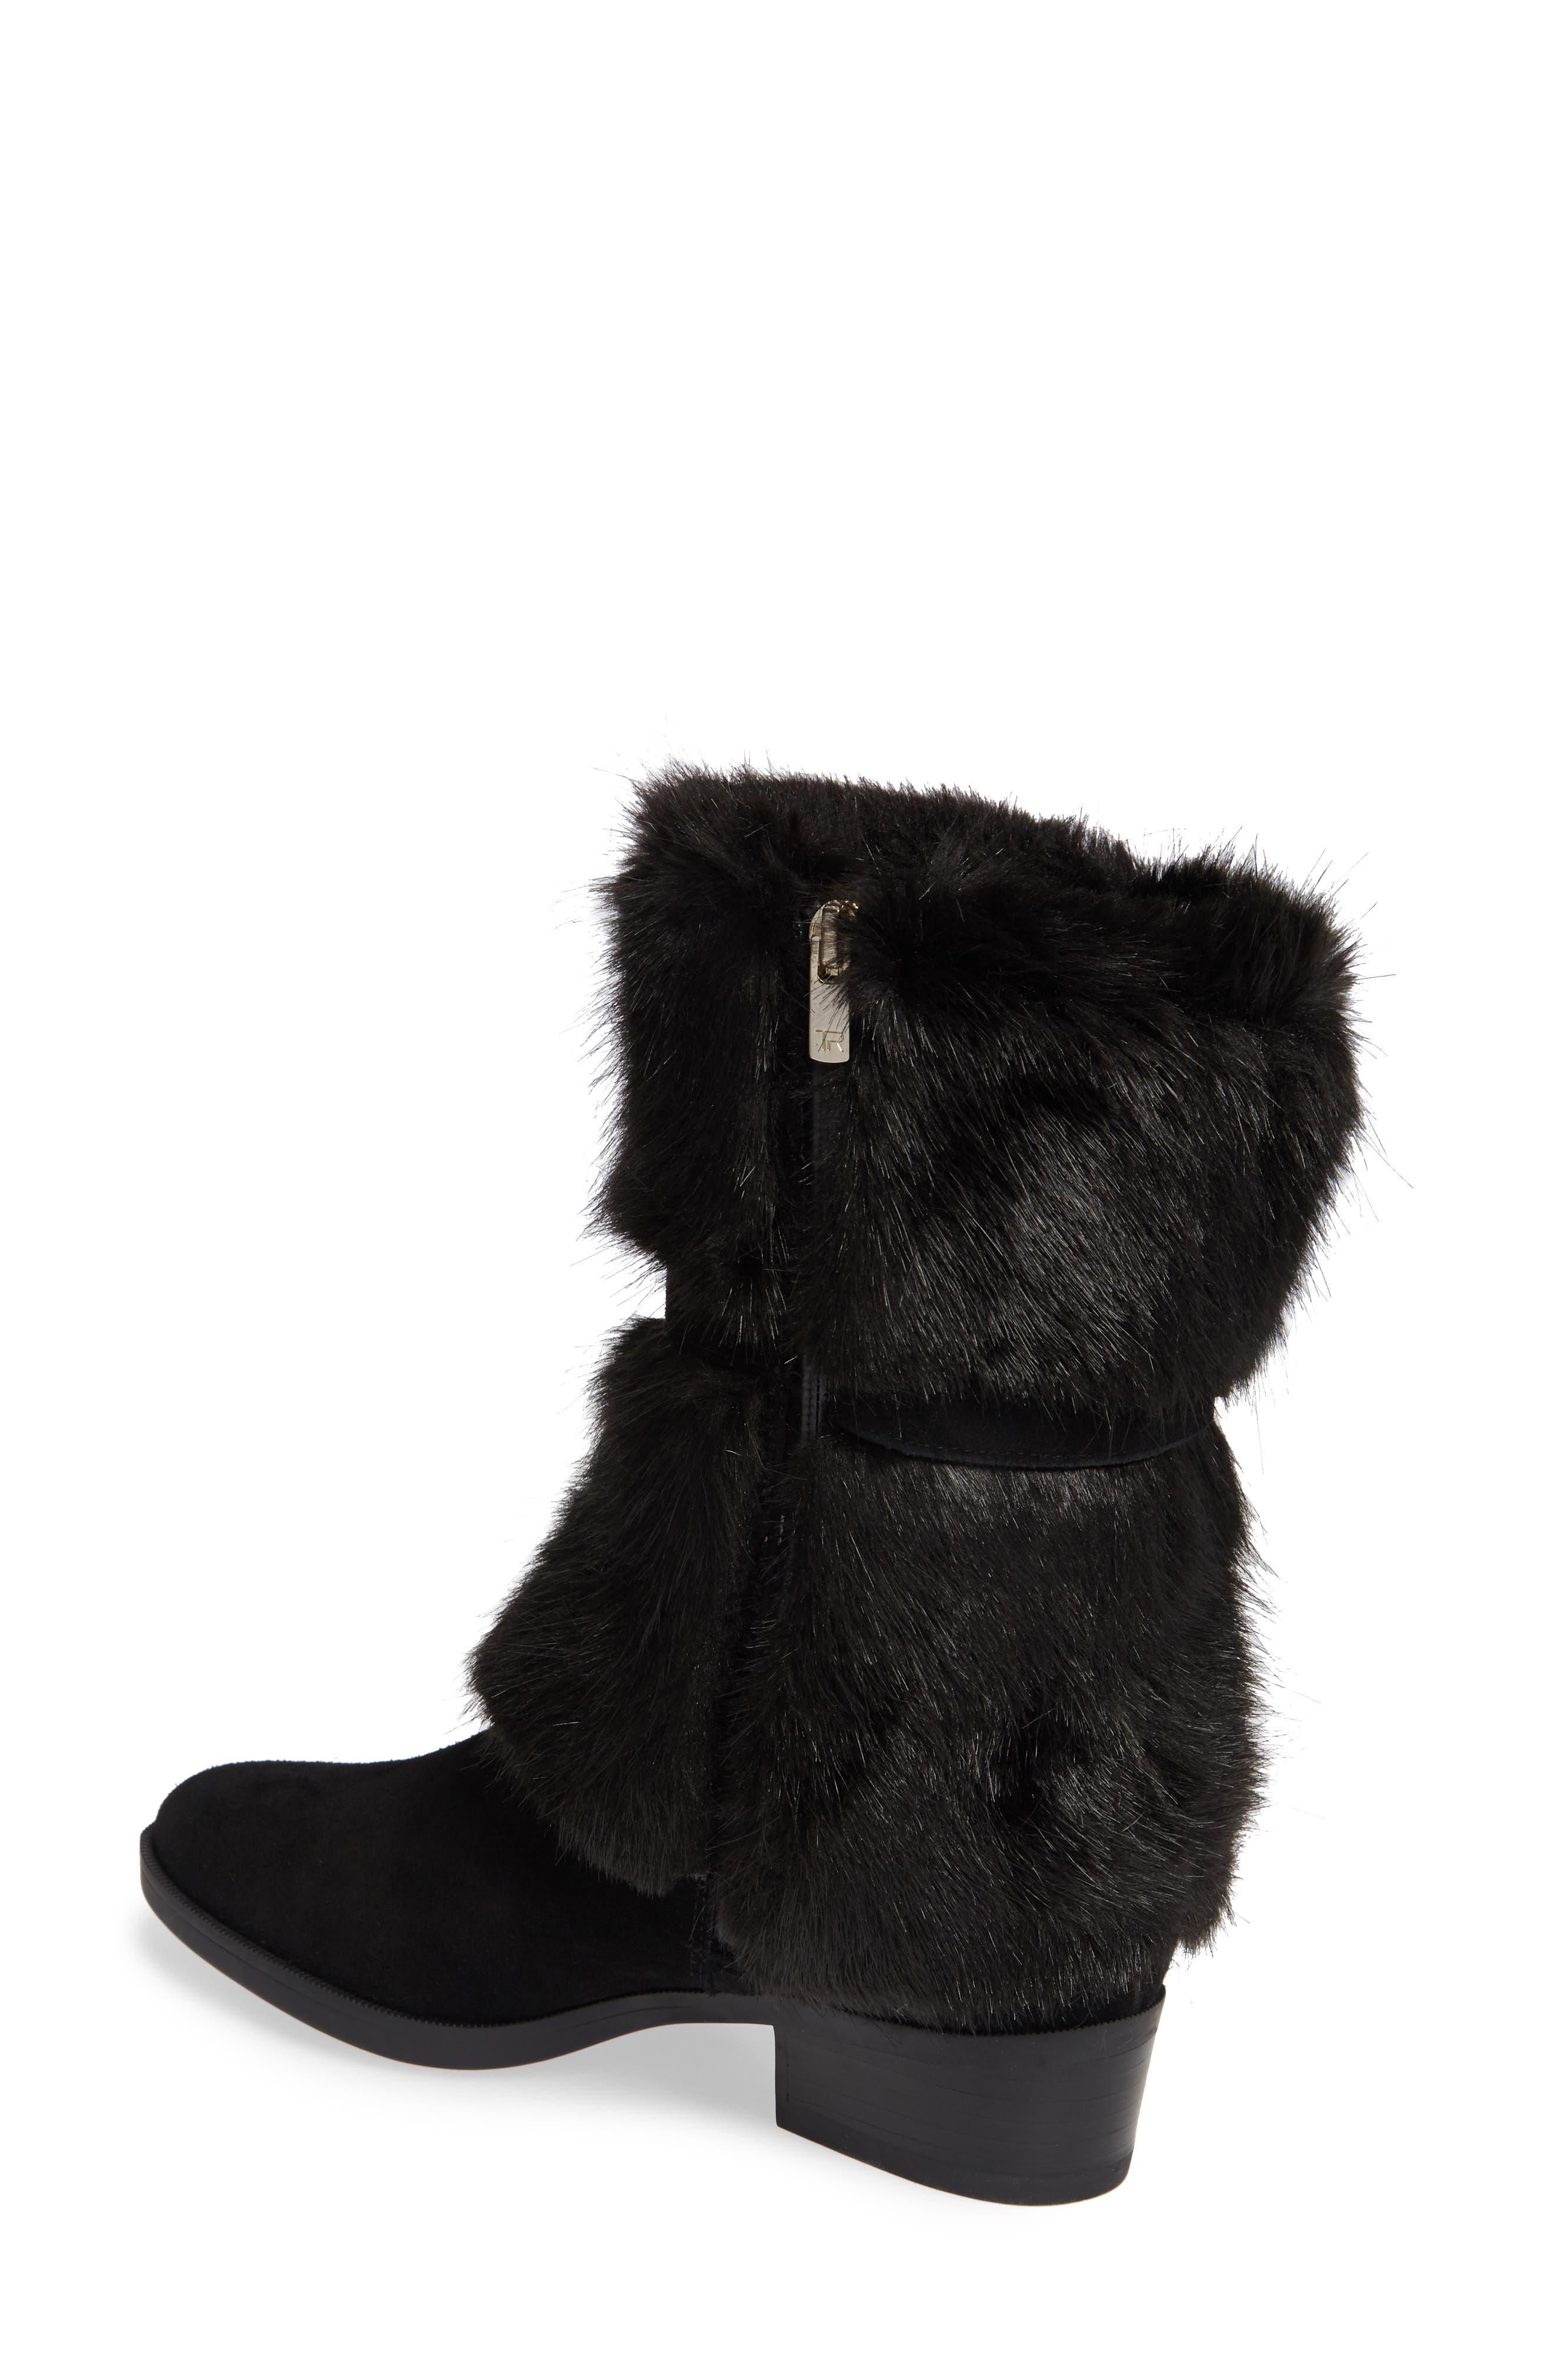 Giselle Water Resistant Faux Fur Boot,                             Alternate thumbnail 2, color,                             BLACK SUEDE